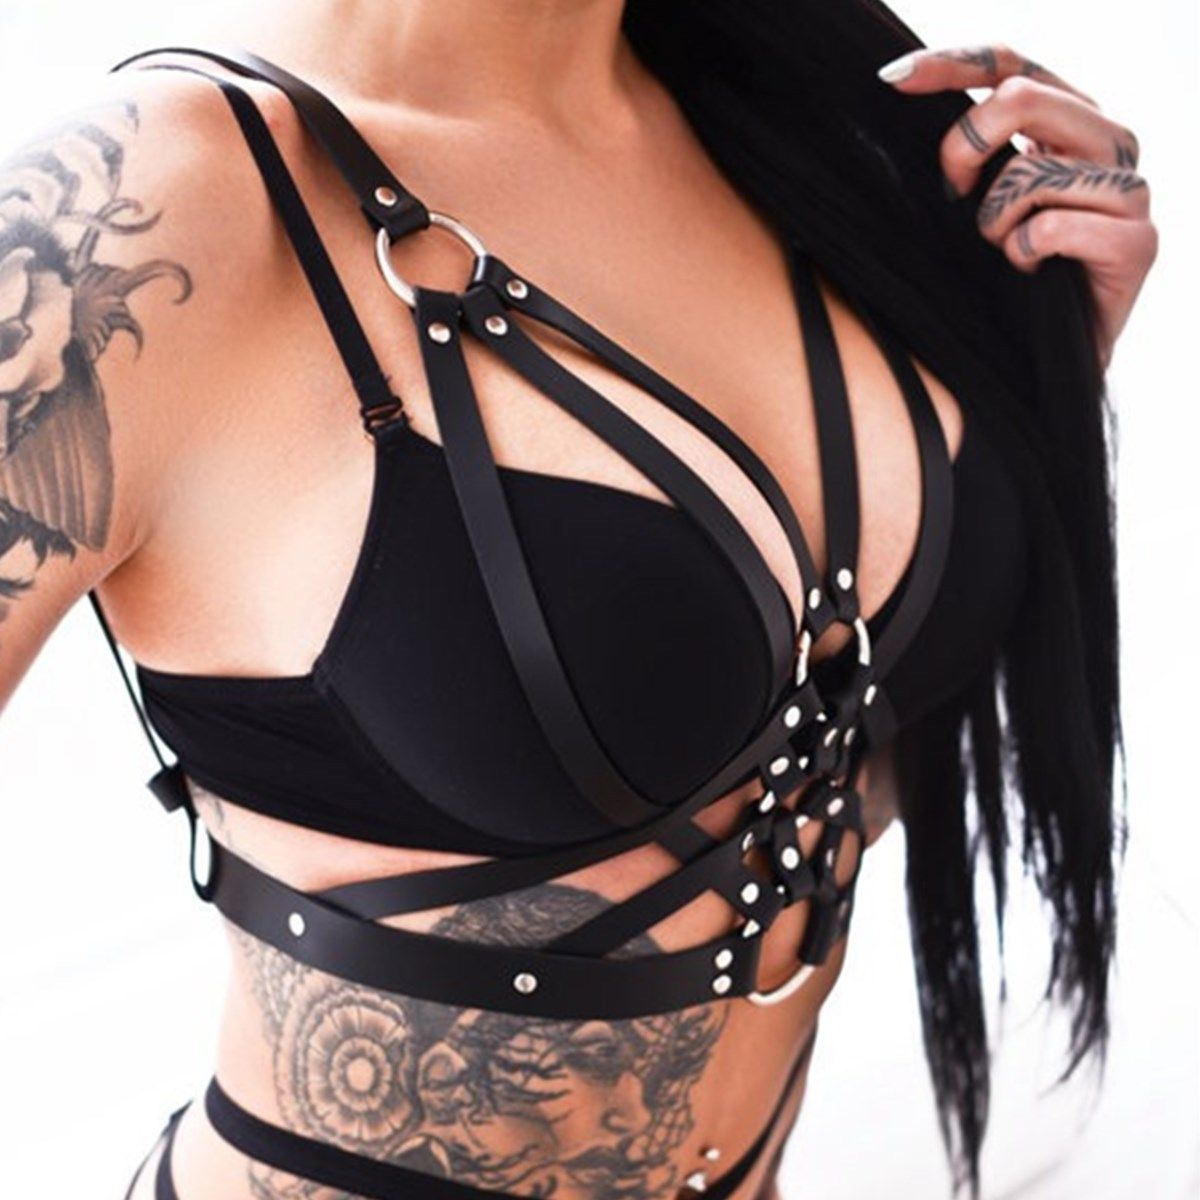 Women Body Leather Chest Harness Punk Gothic Adjustable Strap Bodysuit Bra